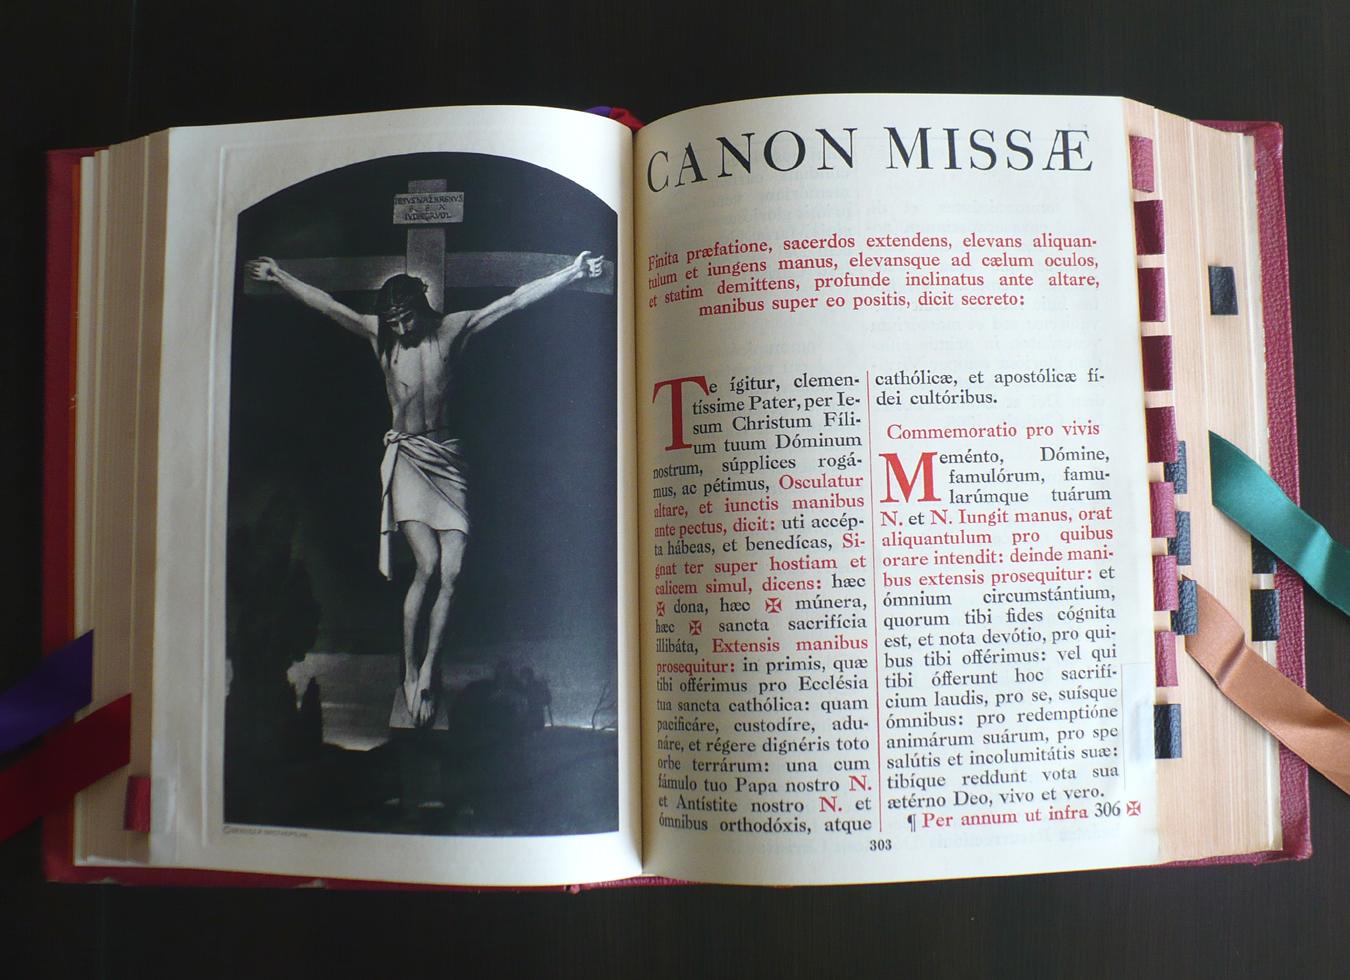 http://upload.wikimedia.org/wikipedia/commons/5/59/Missale_romanum1962.JPG